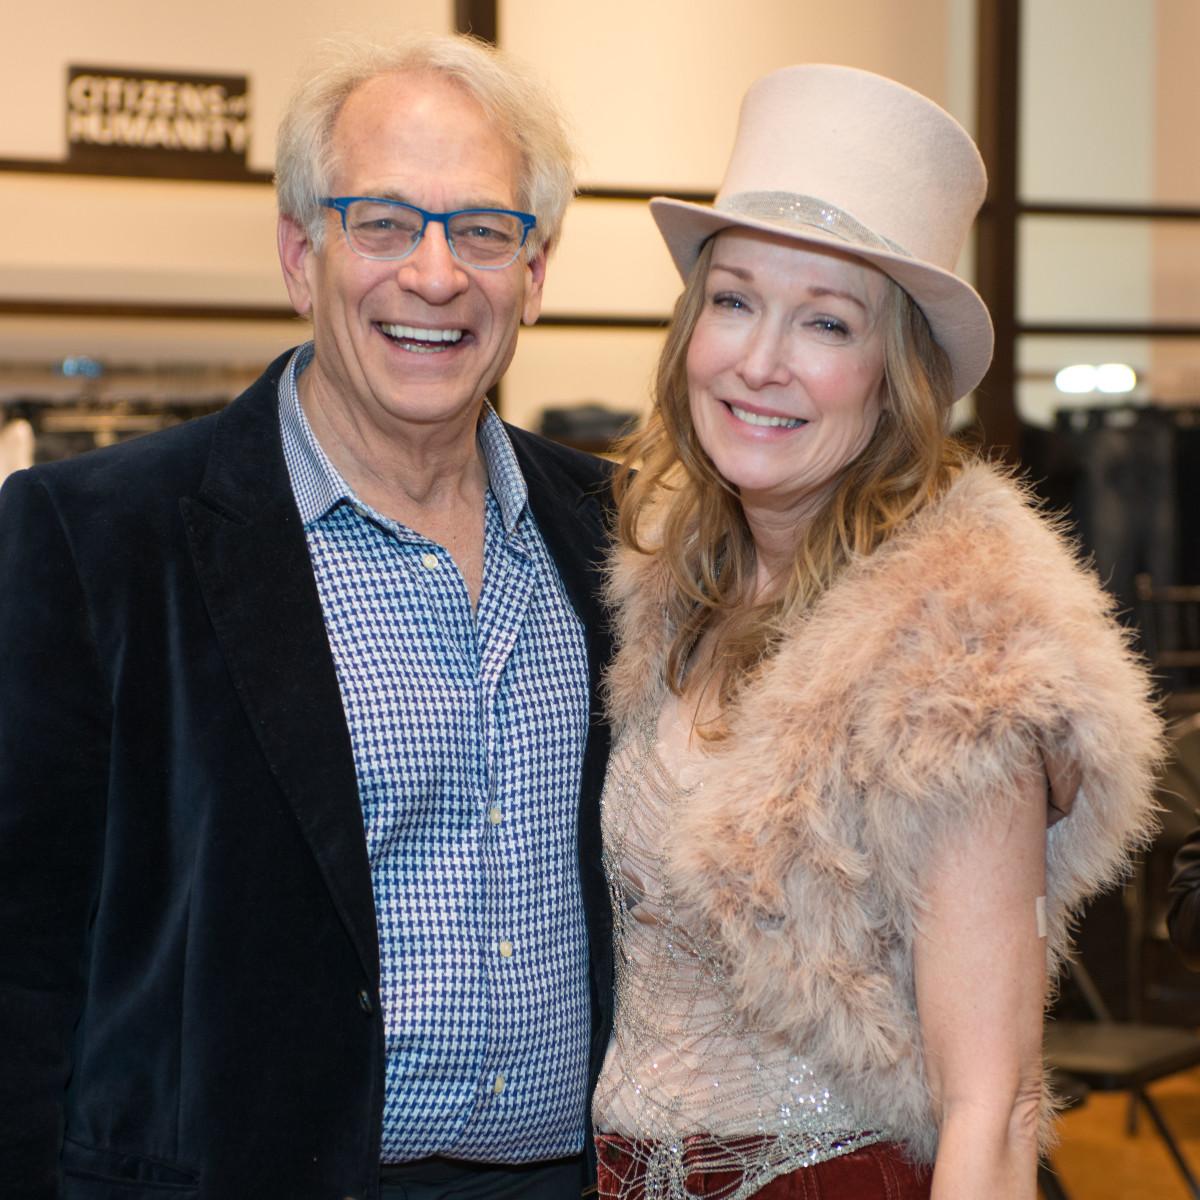 Tootsies Love's In Fashion, Feb. 2016, Mickey Rosmarin, Holly Waltrip